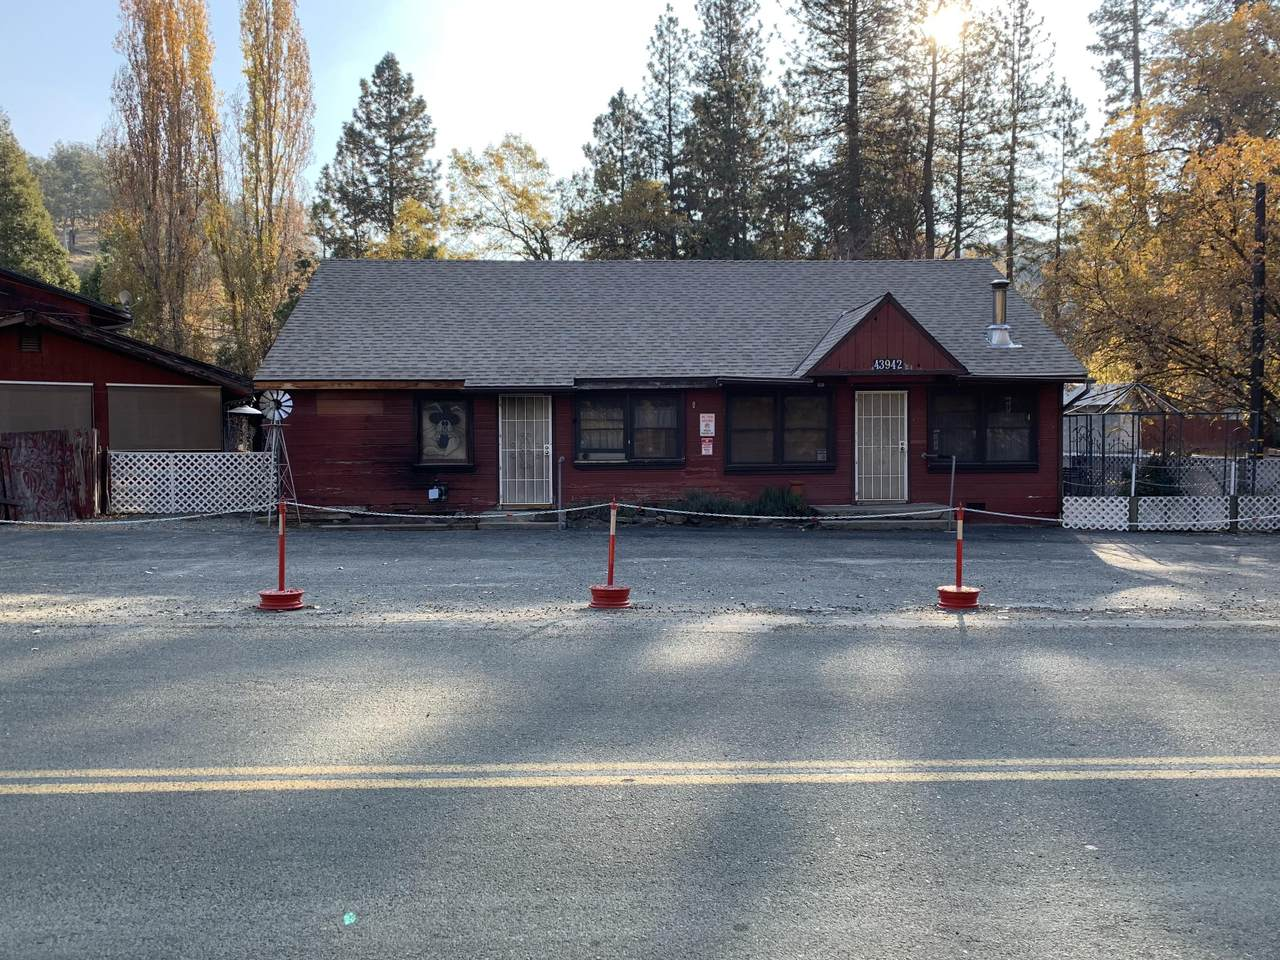 43942 Pine Flat Drive - Photo 1